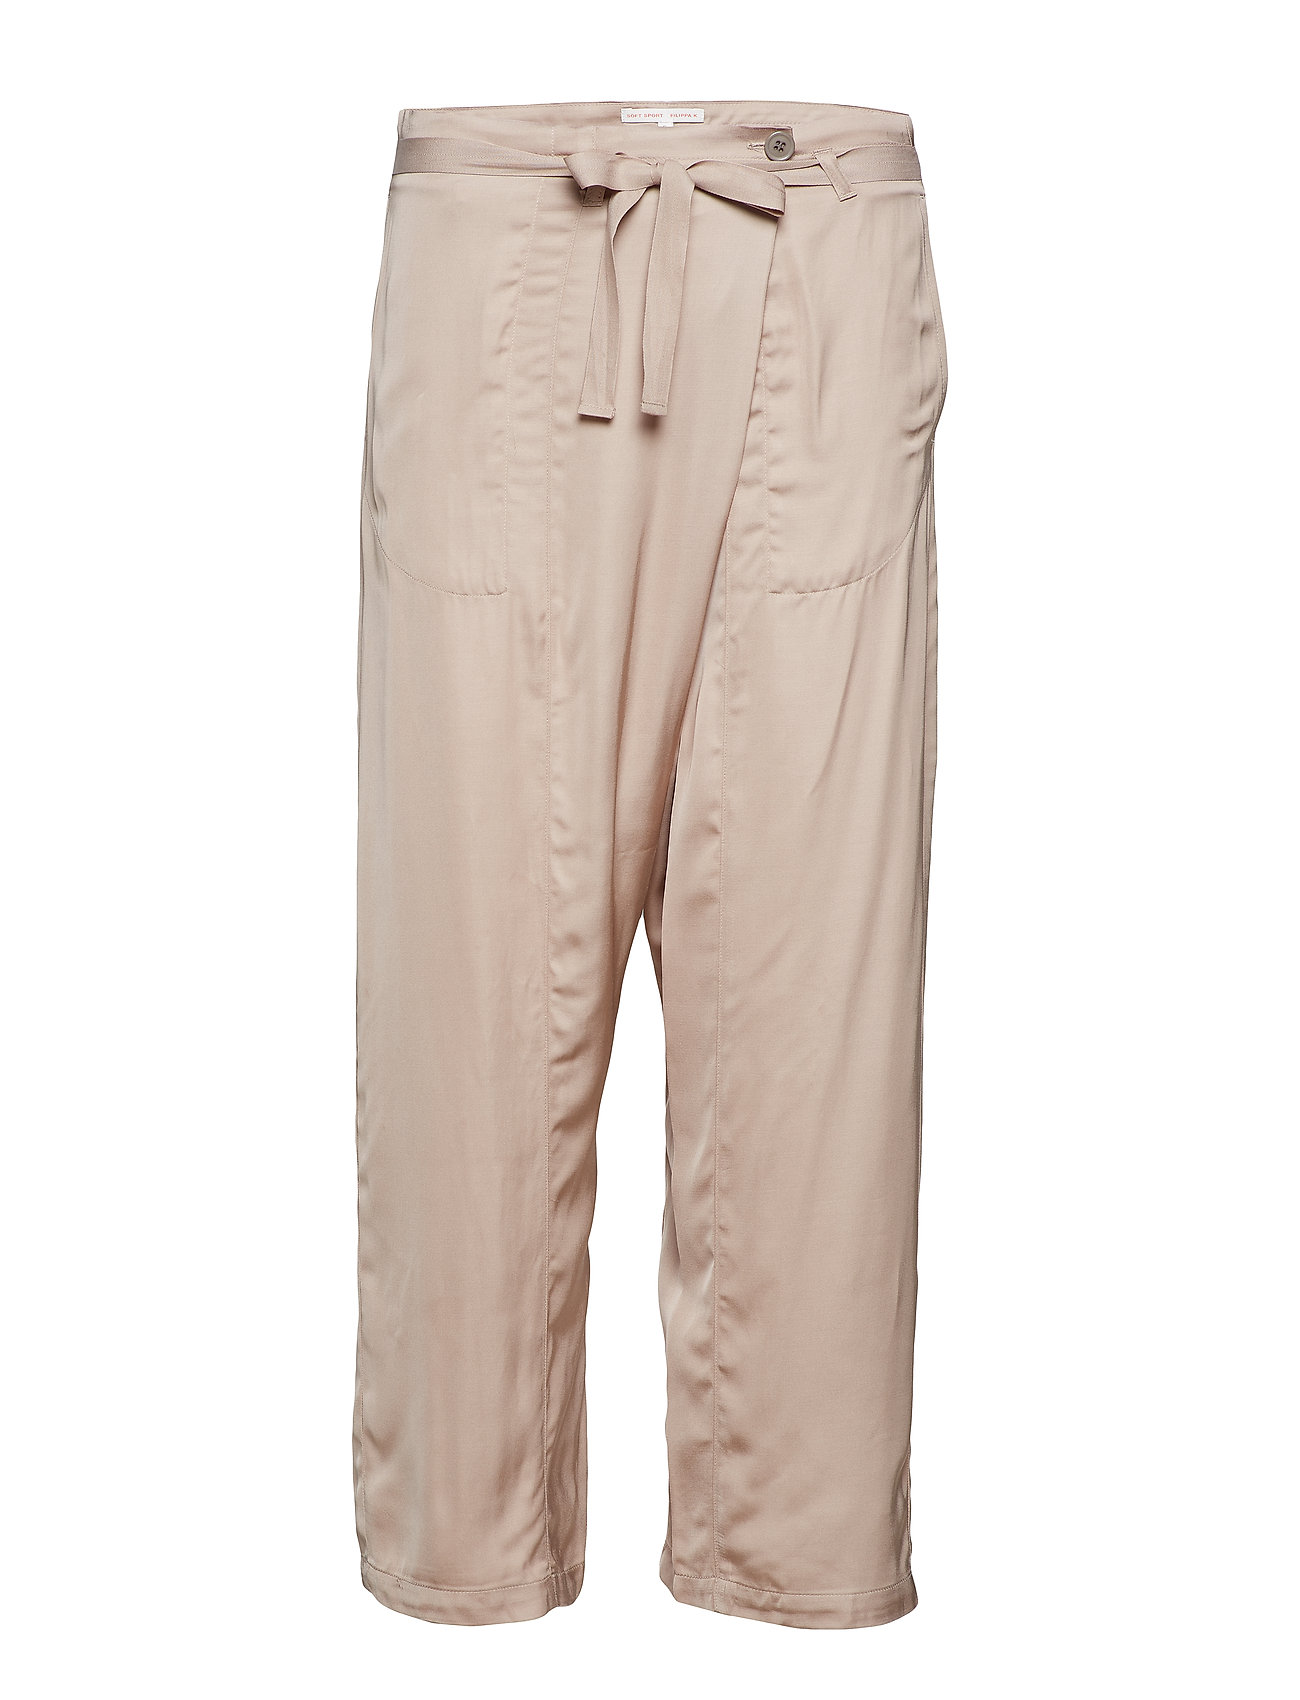 Jasmine Thai Pants - Filippa K